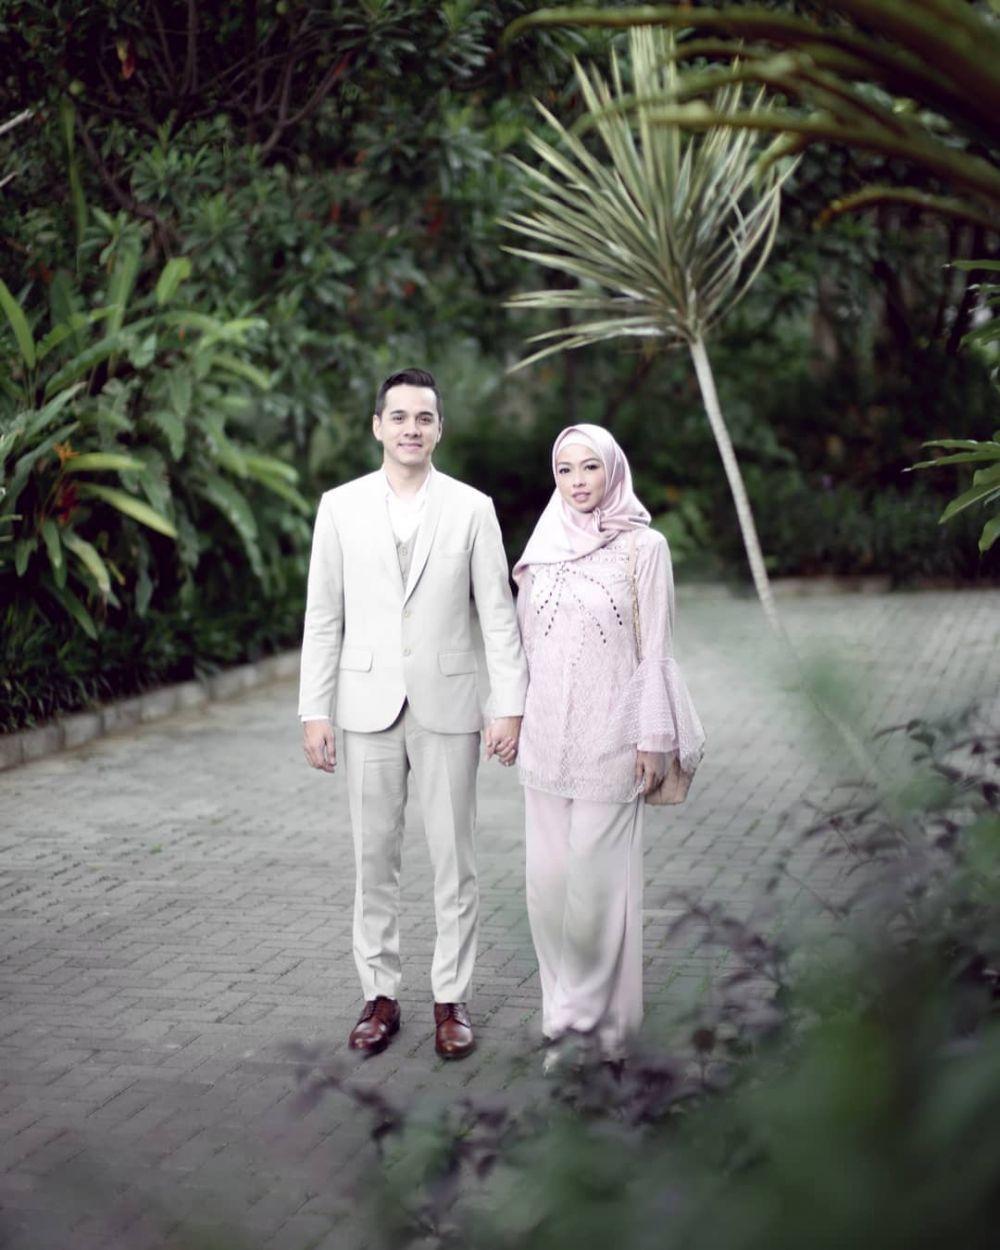 12 Tahun Menikah, Intip 10 Potret Kemesraan Rionaldo Stokhorst & Istri